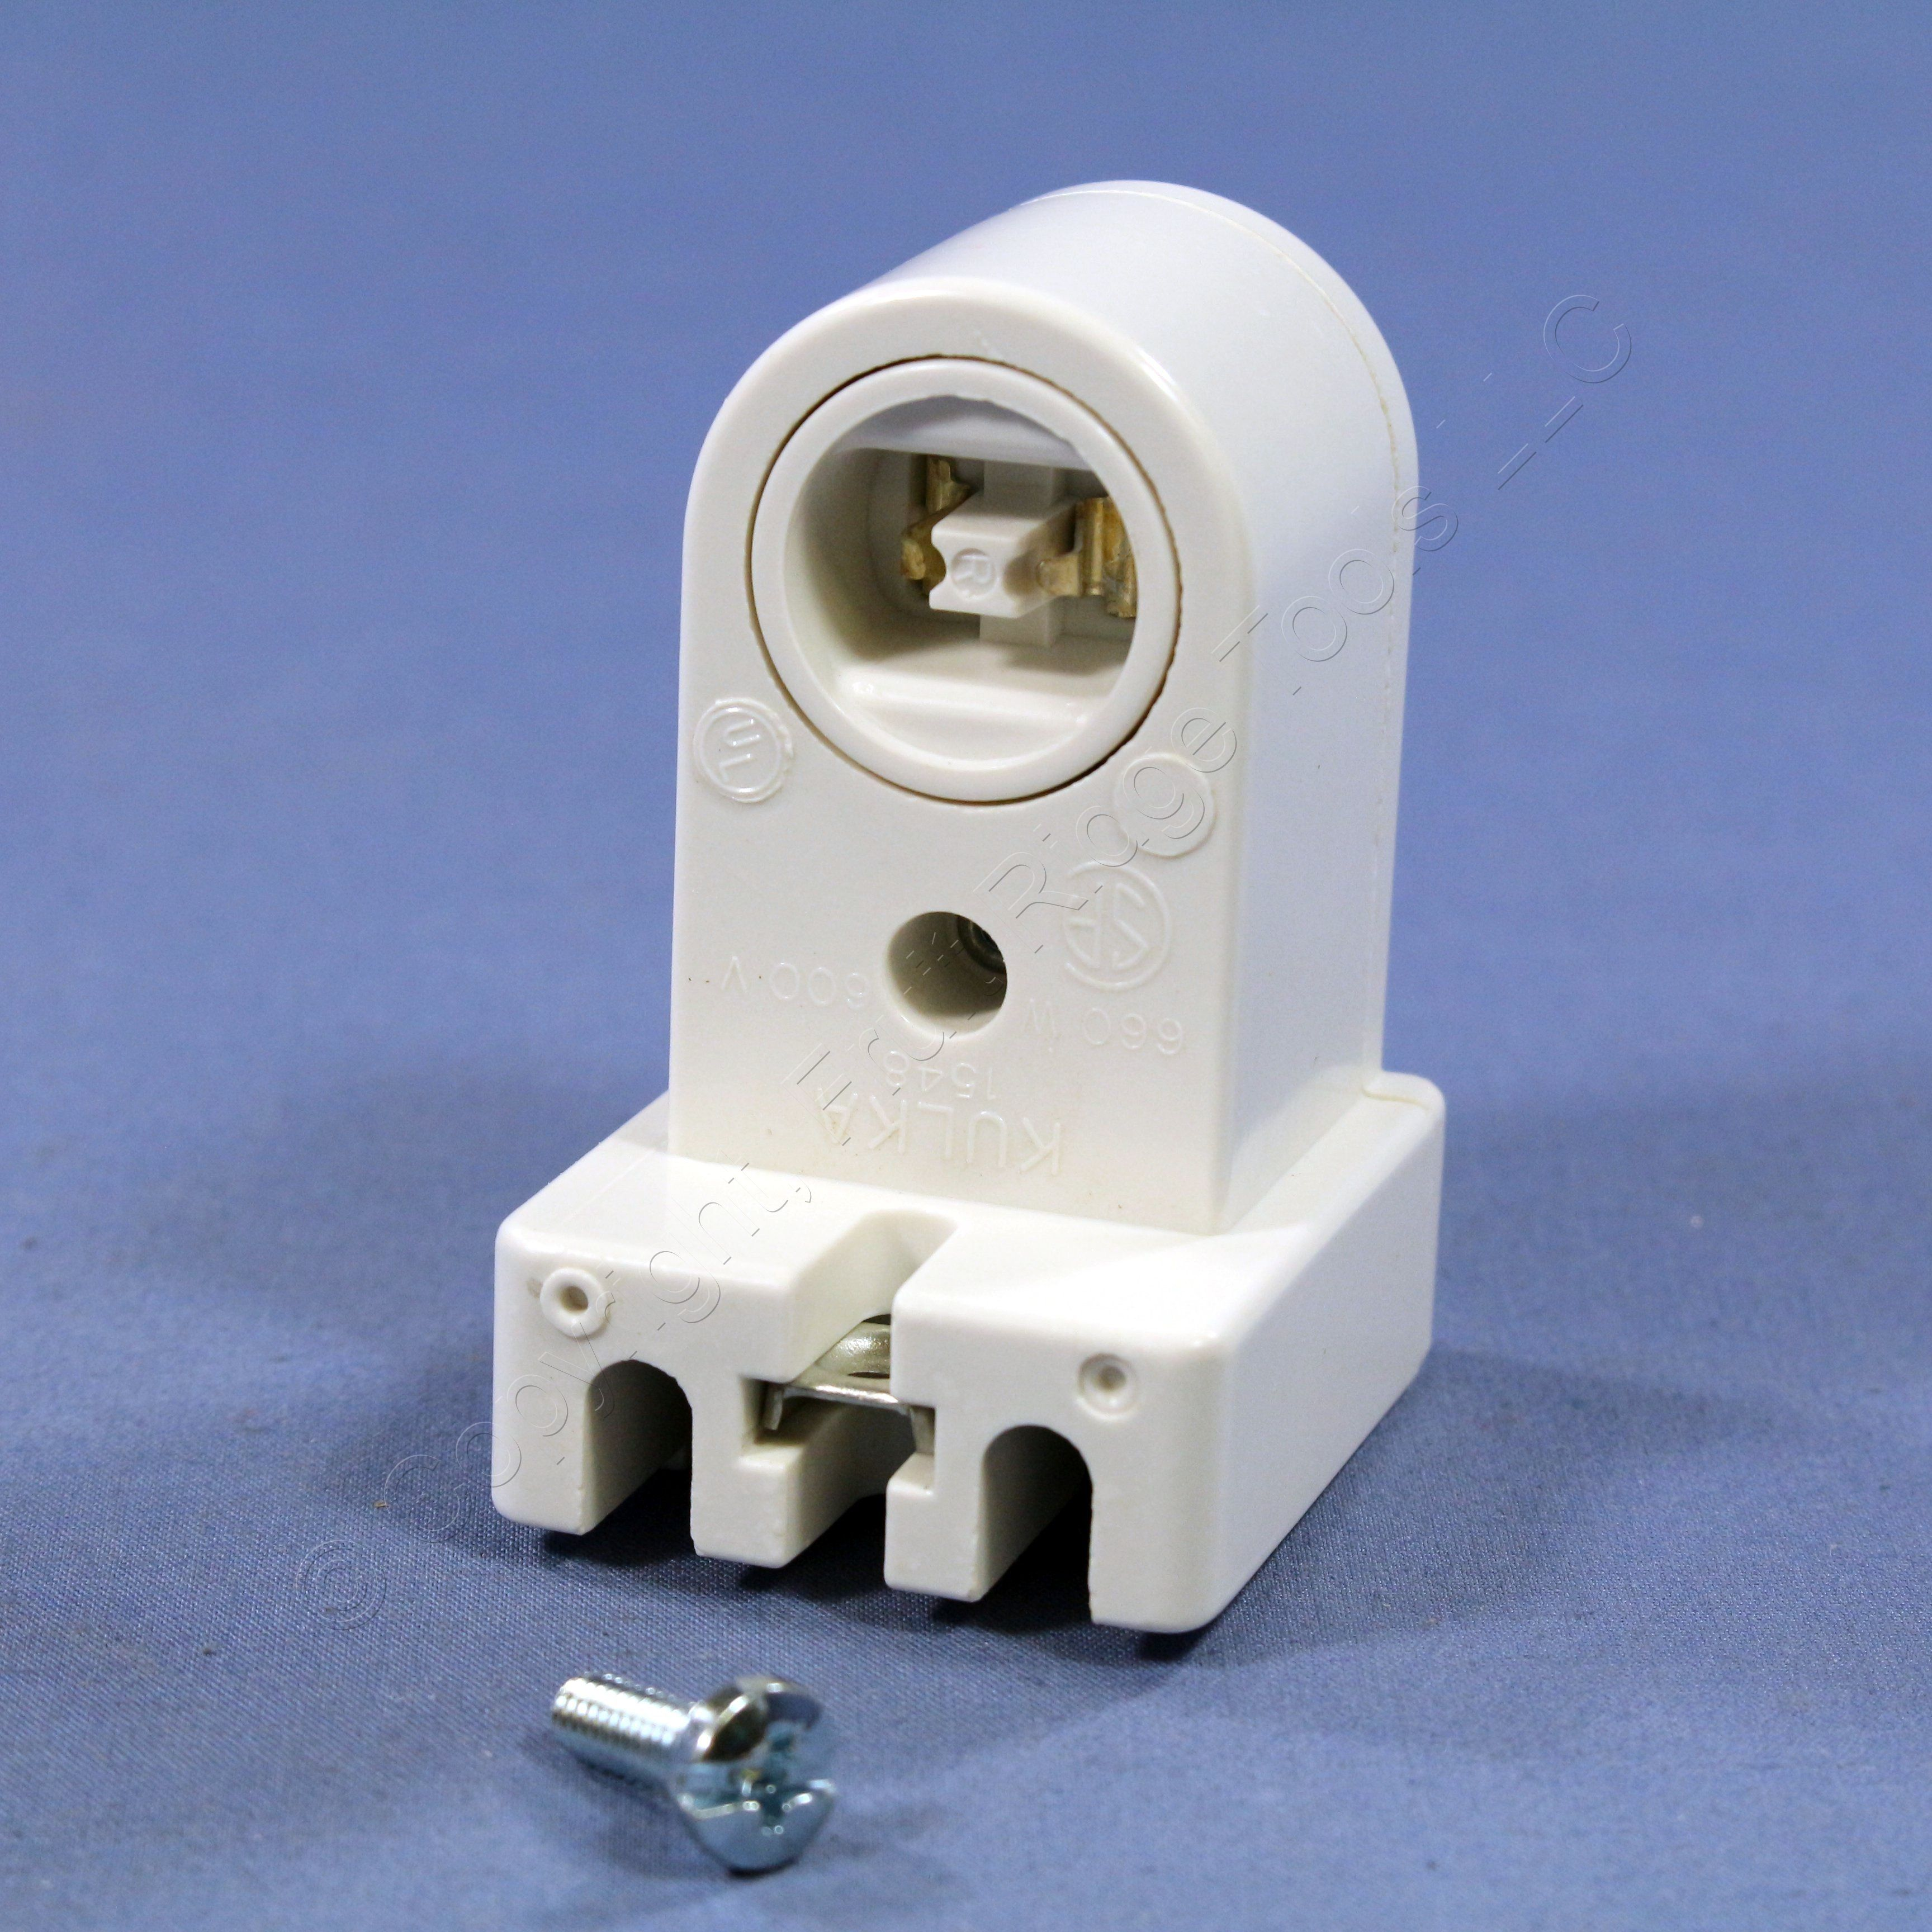 fluorescent light holder dodge journey engine diagram new p ands white ho t8 t12 lamp